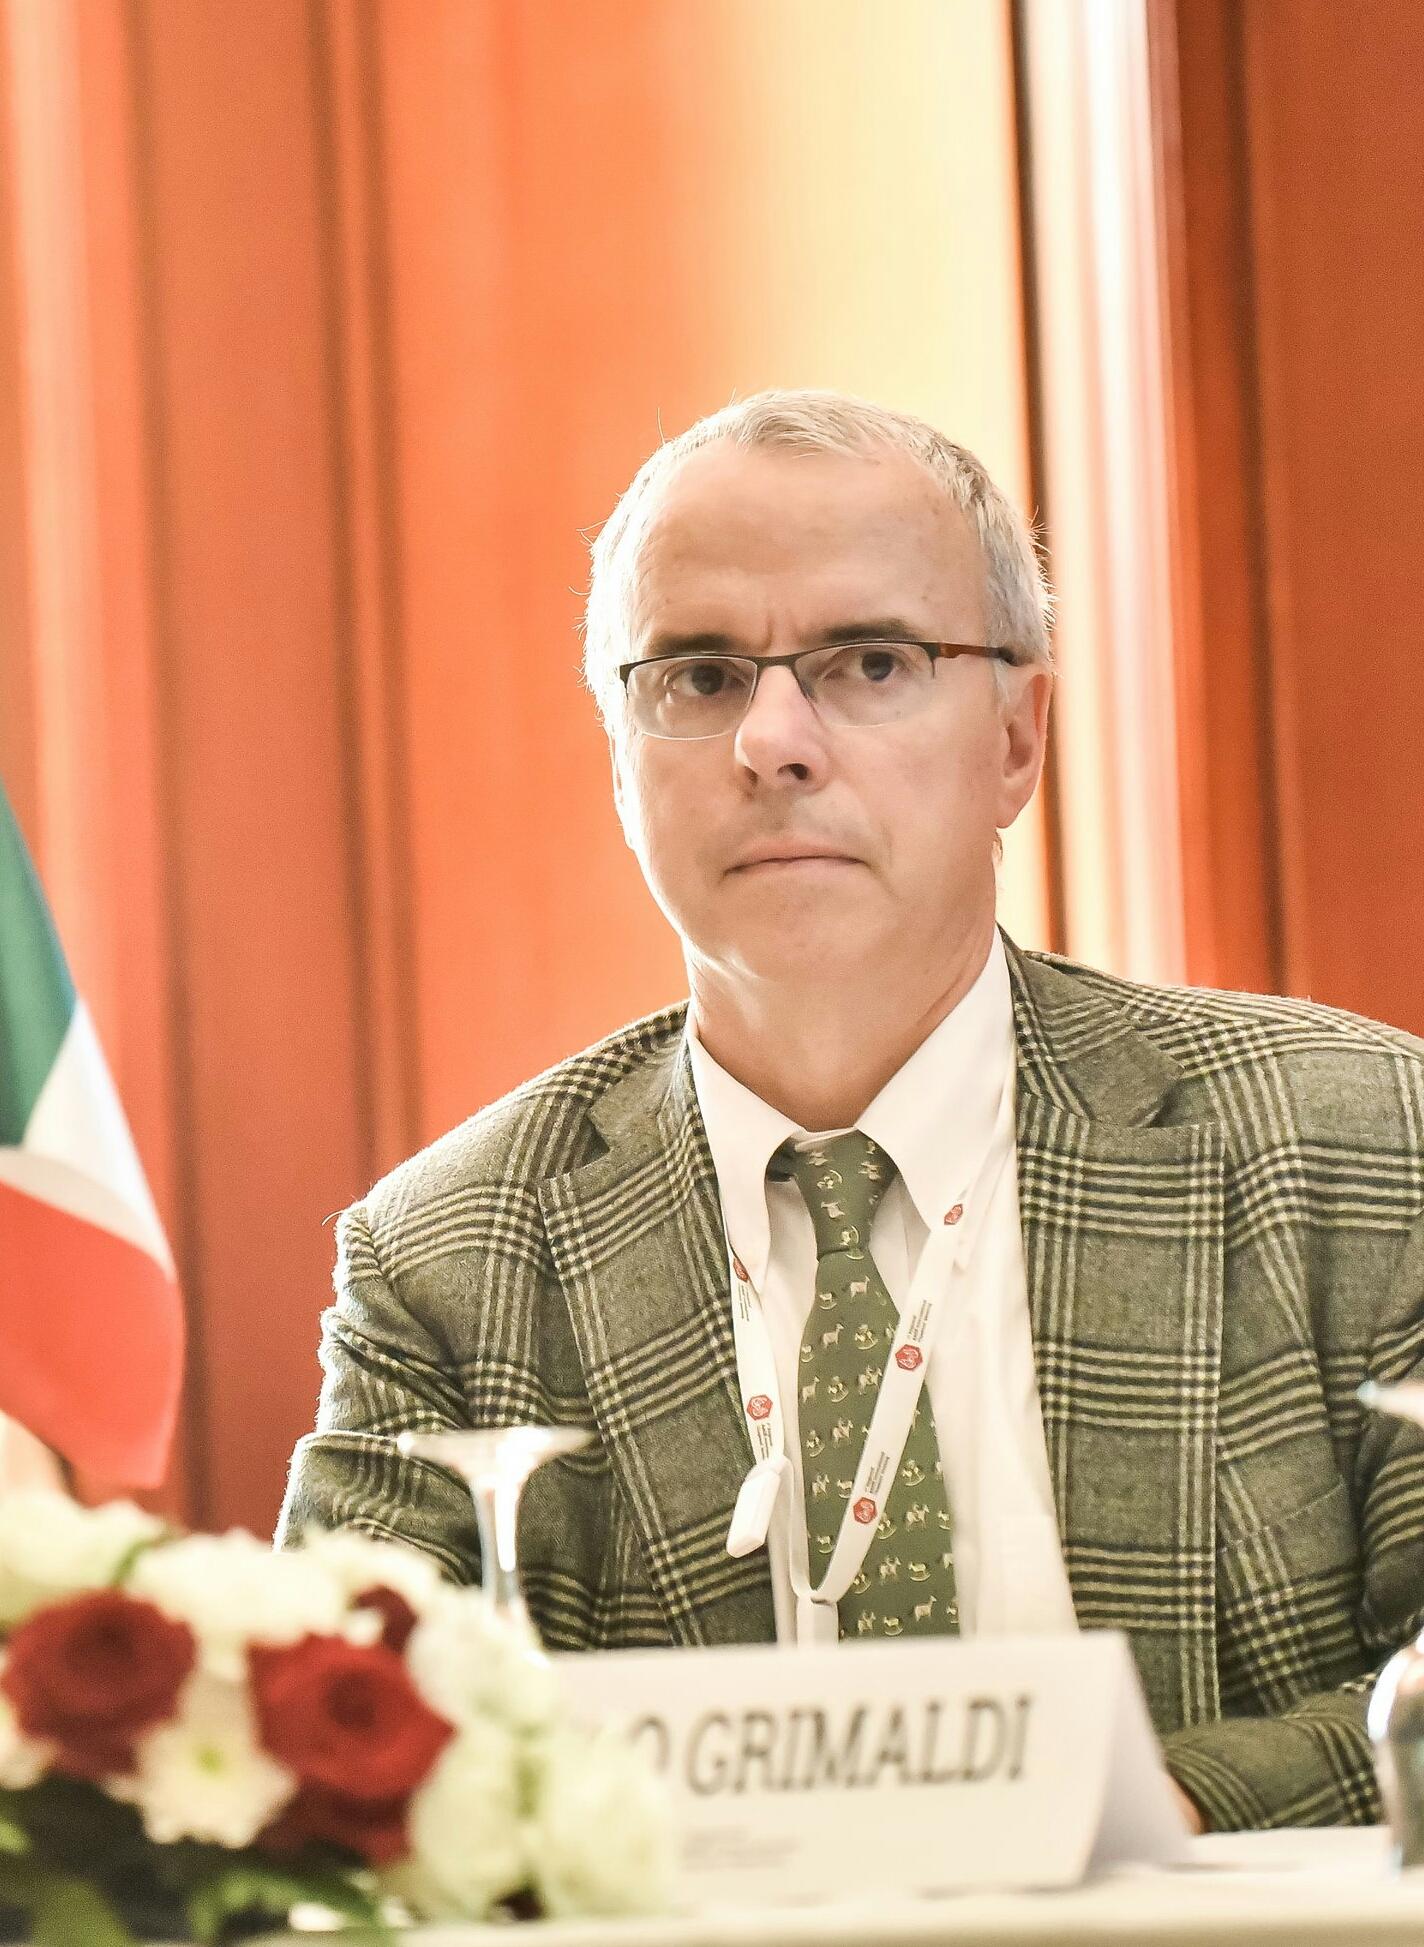 Franco Grimaldi tiroide